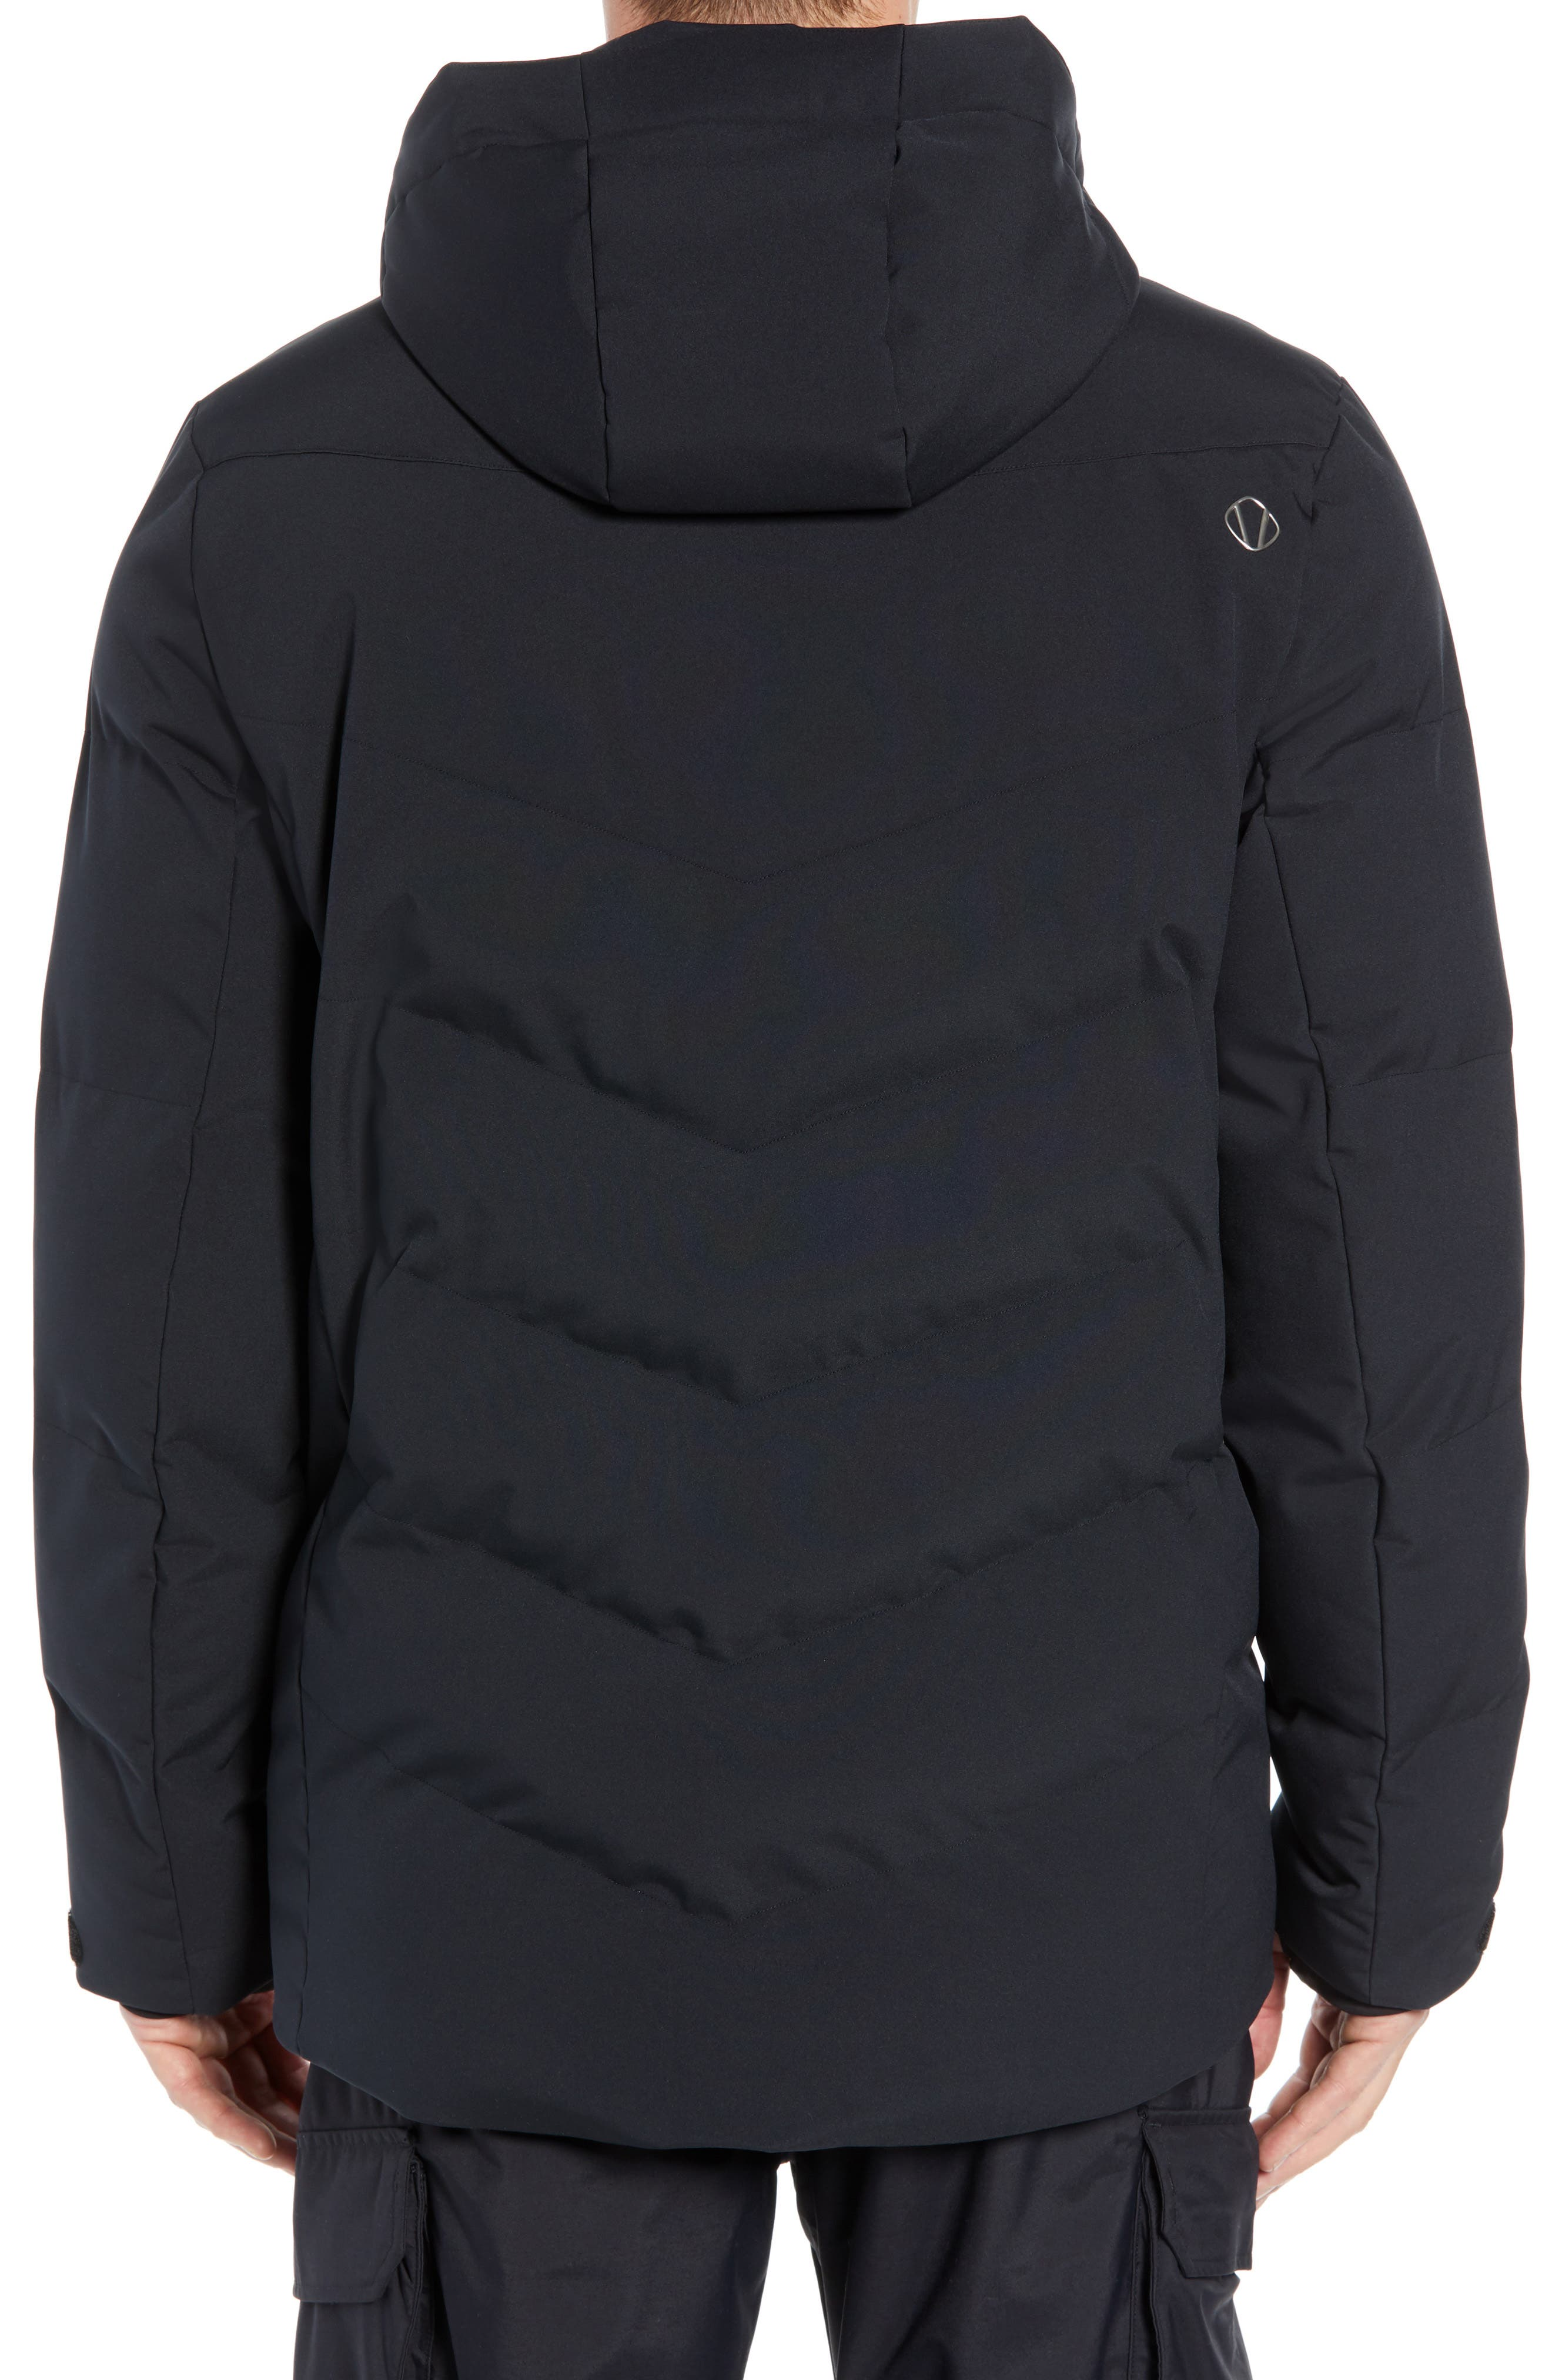 Boulder Waterproof Jacket,                             Alternate thumbnail 2, color,                             001